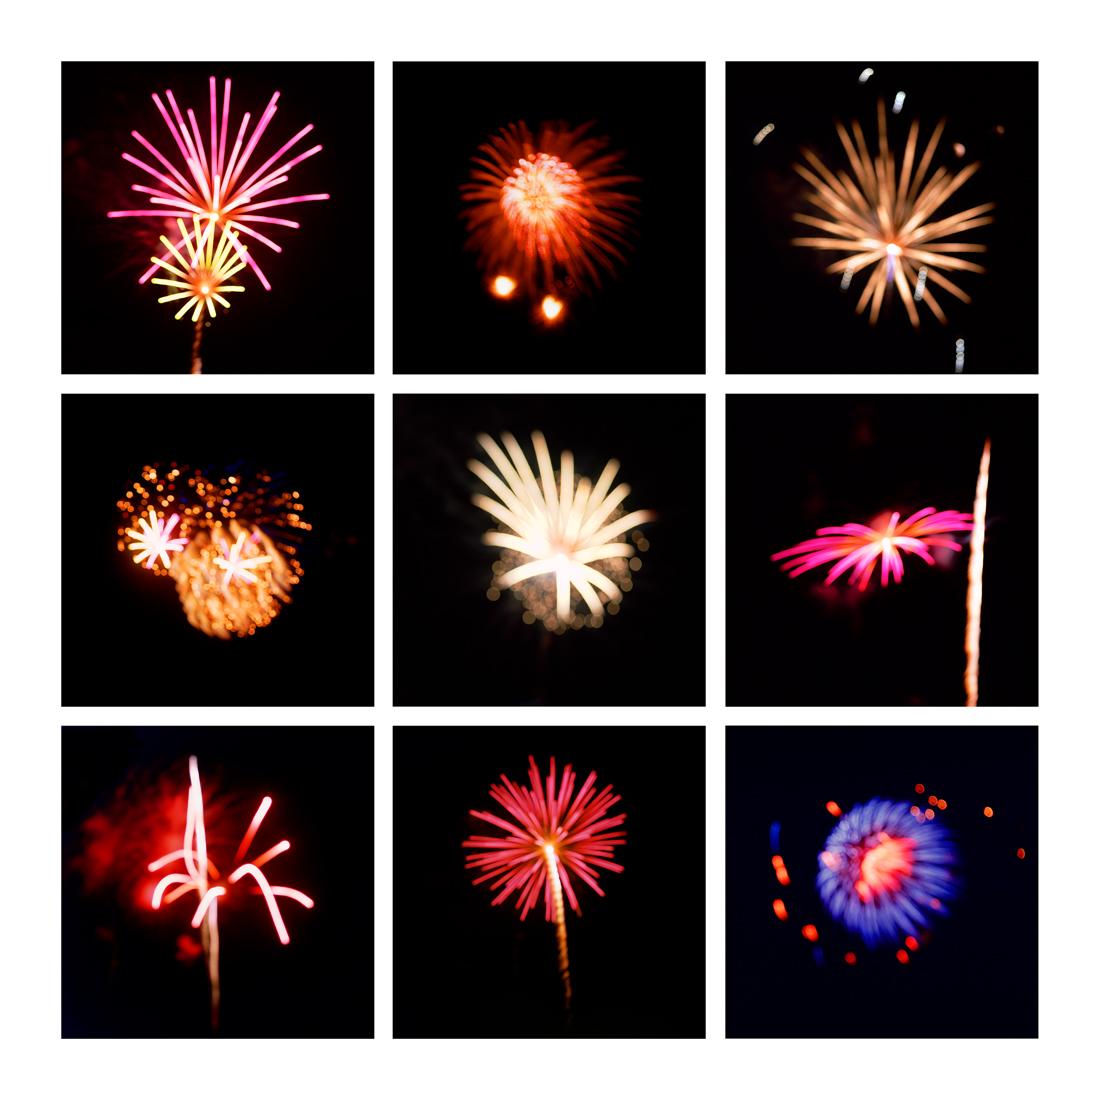 Fireworks #2, 2019 (2008-2019)